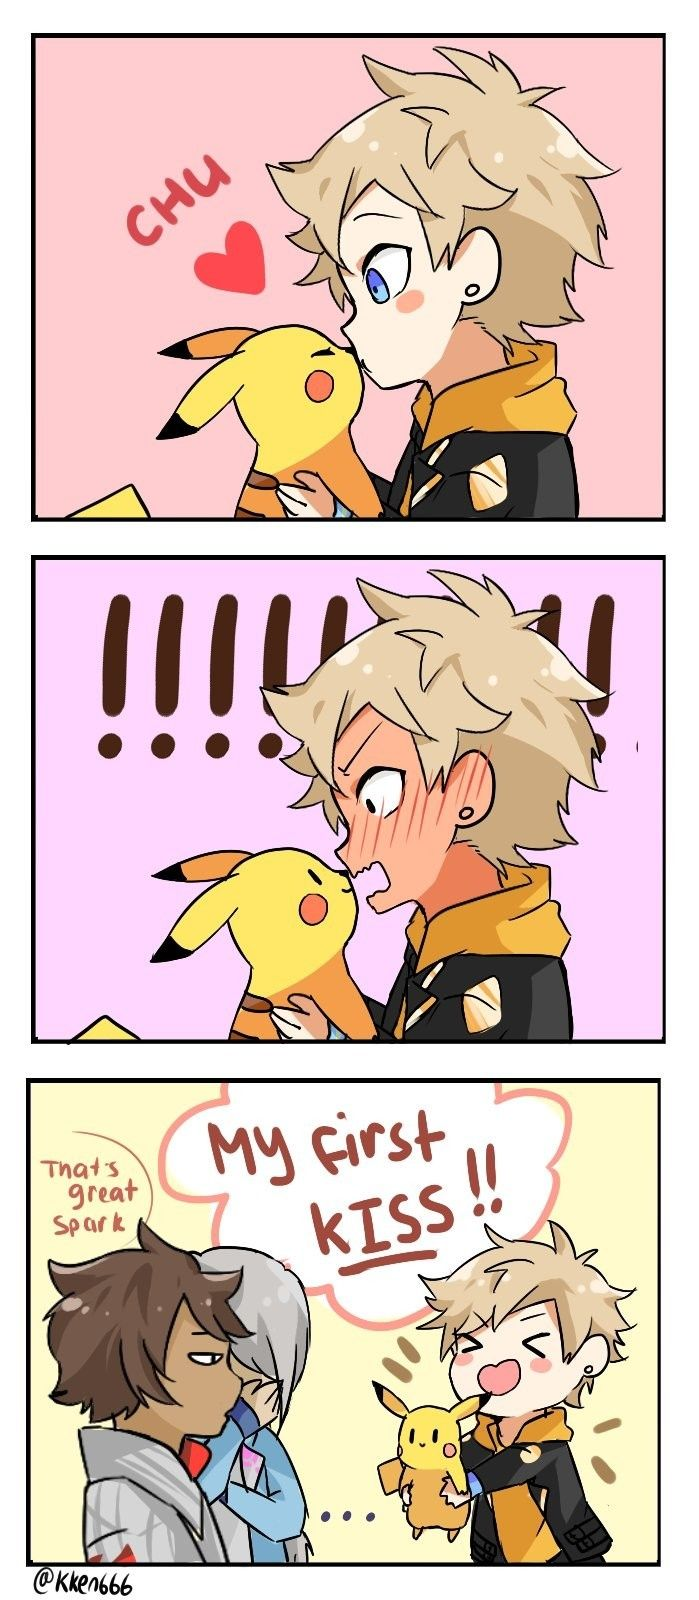 Funny and sweet Pokémon kiss